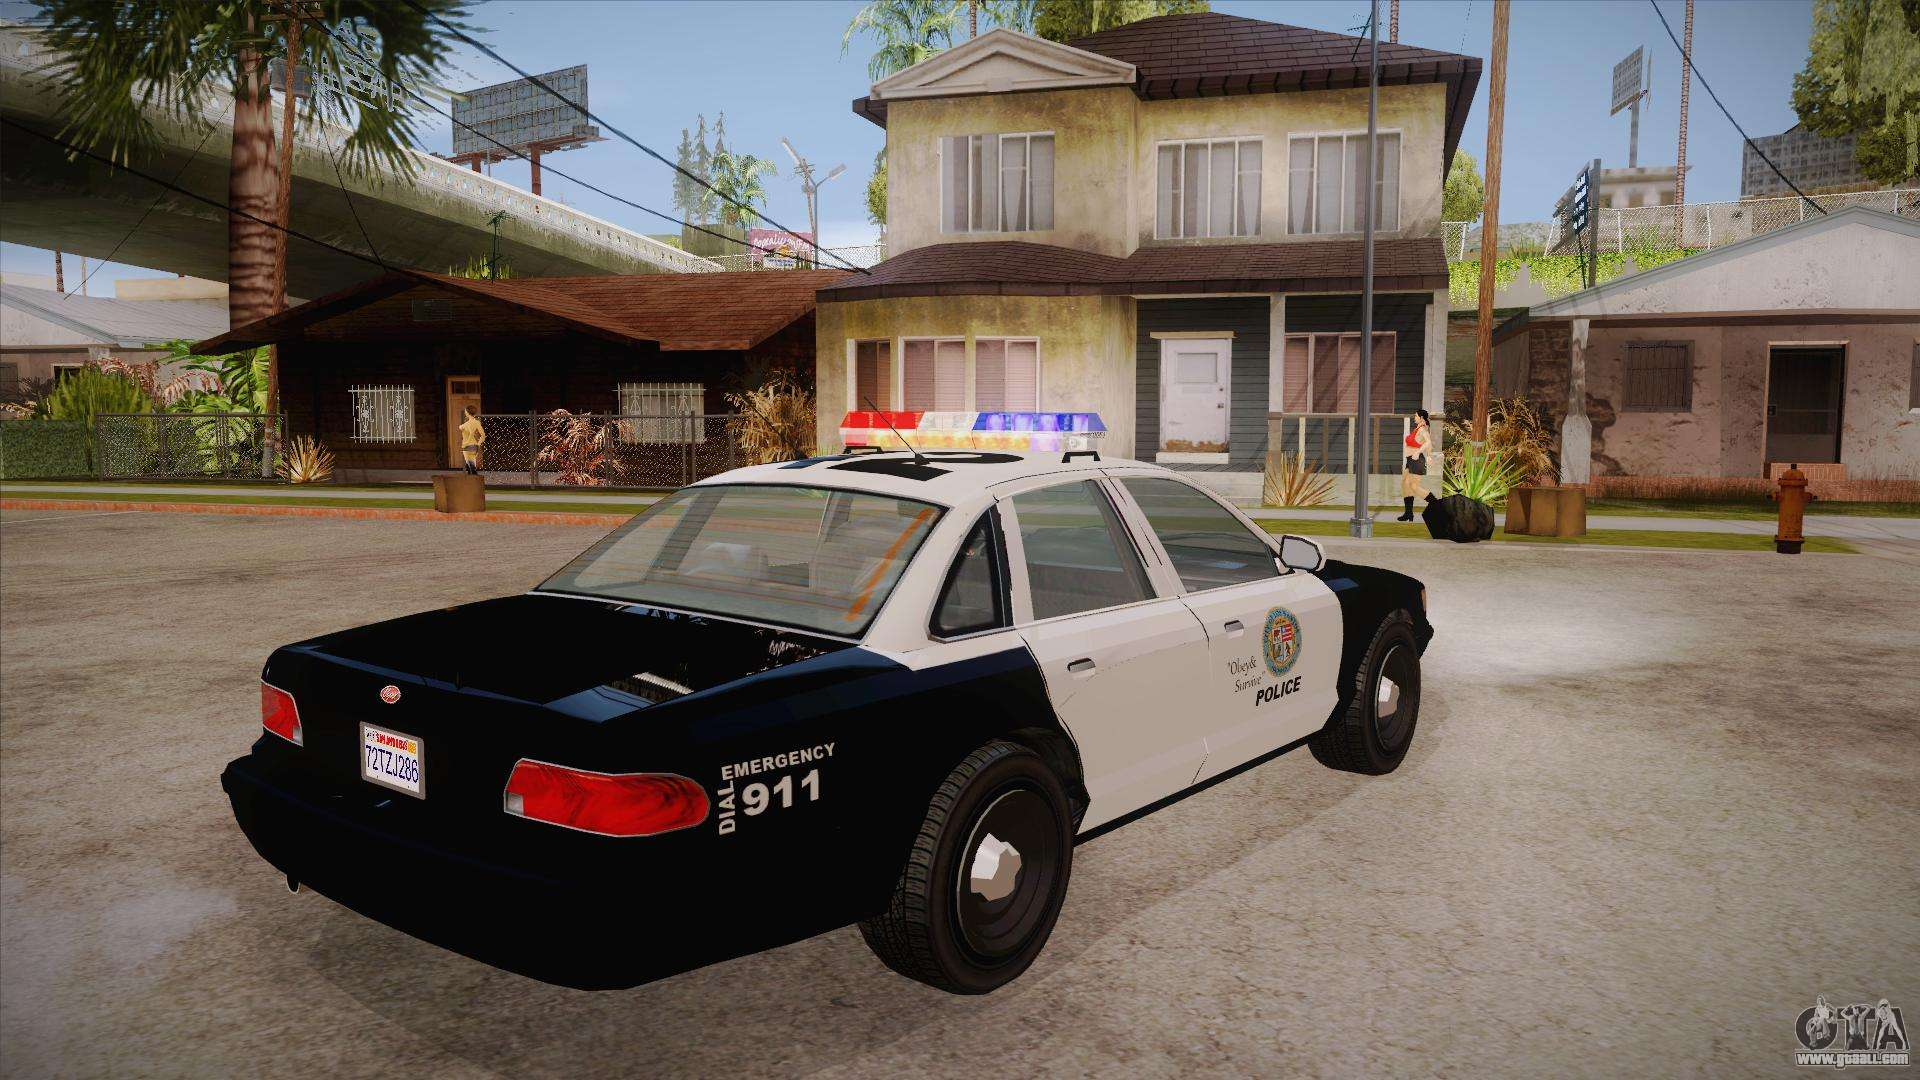 Vapid GTA V Police Car for GTA San Andreas Gta San Andreas Police Cars